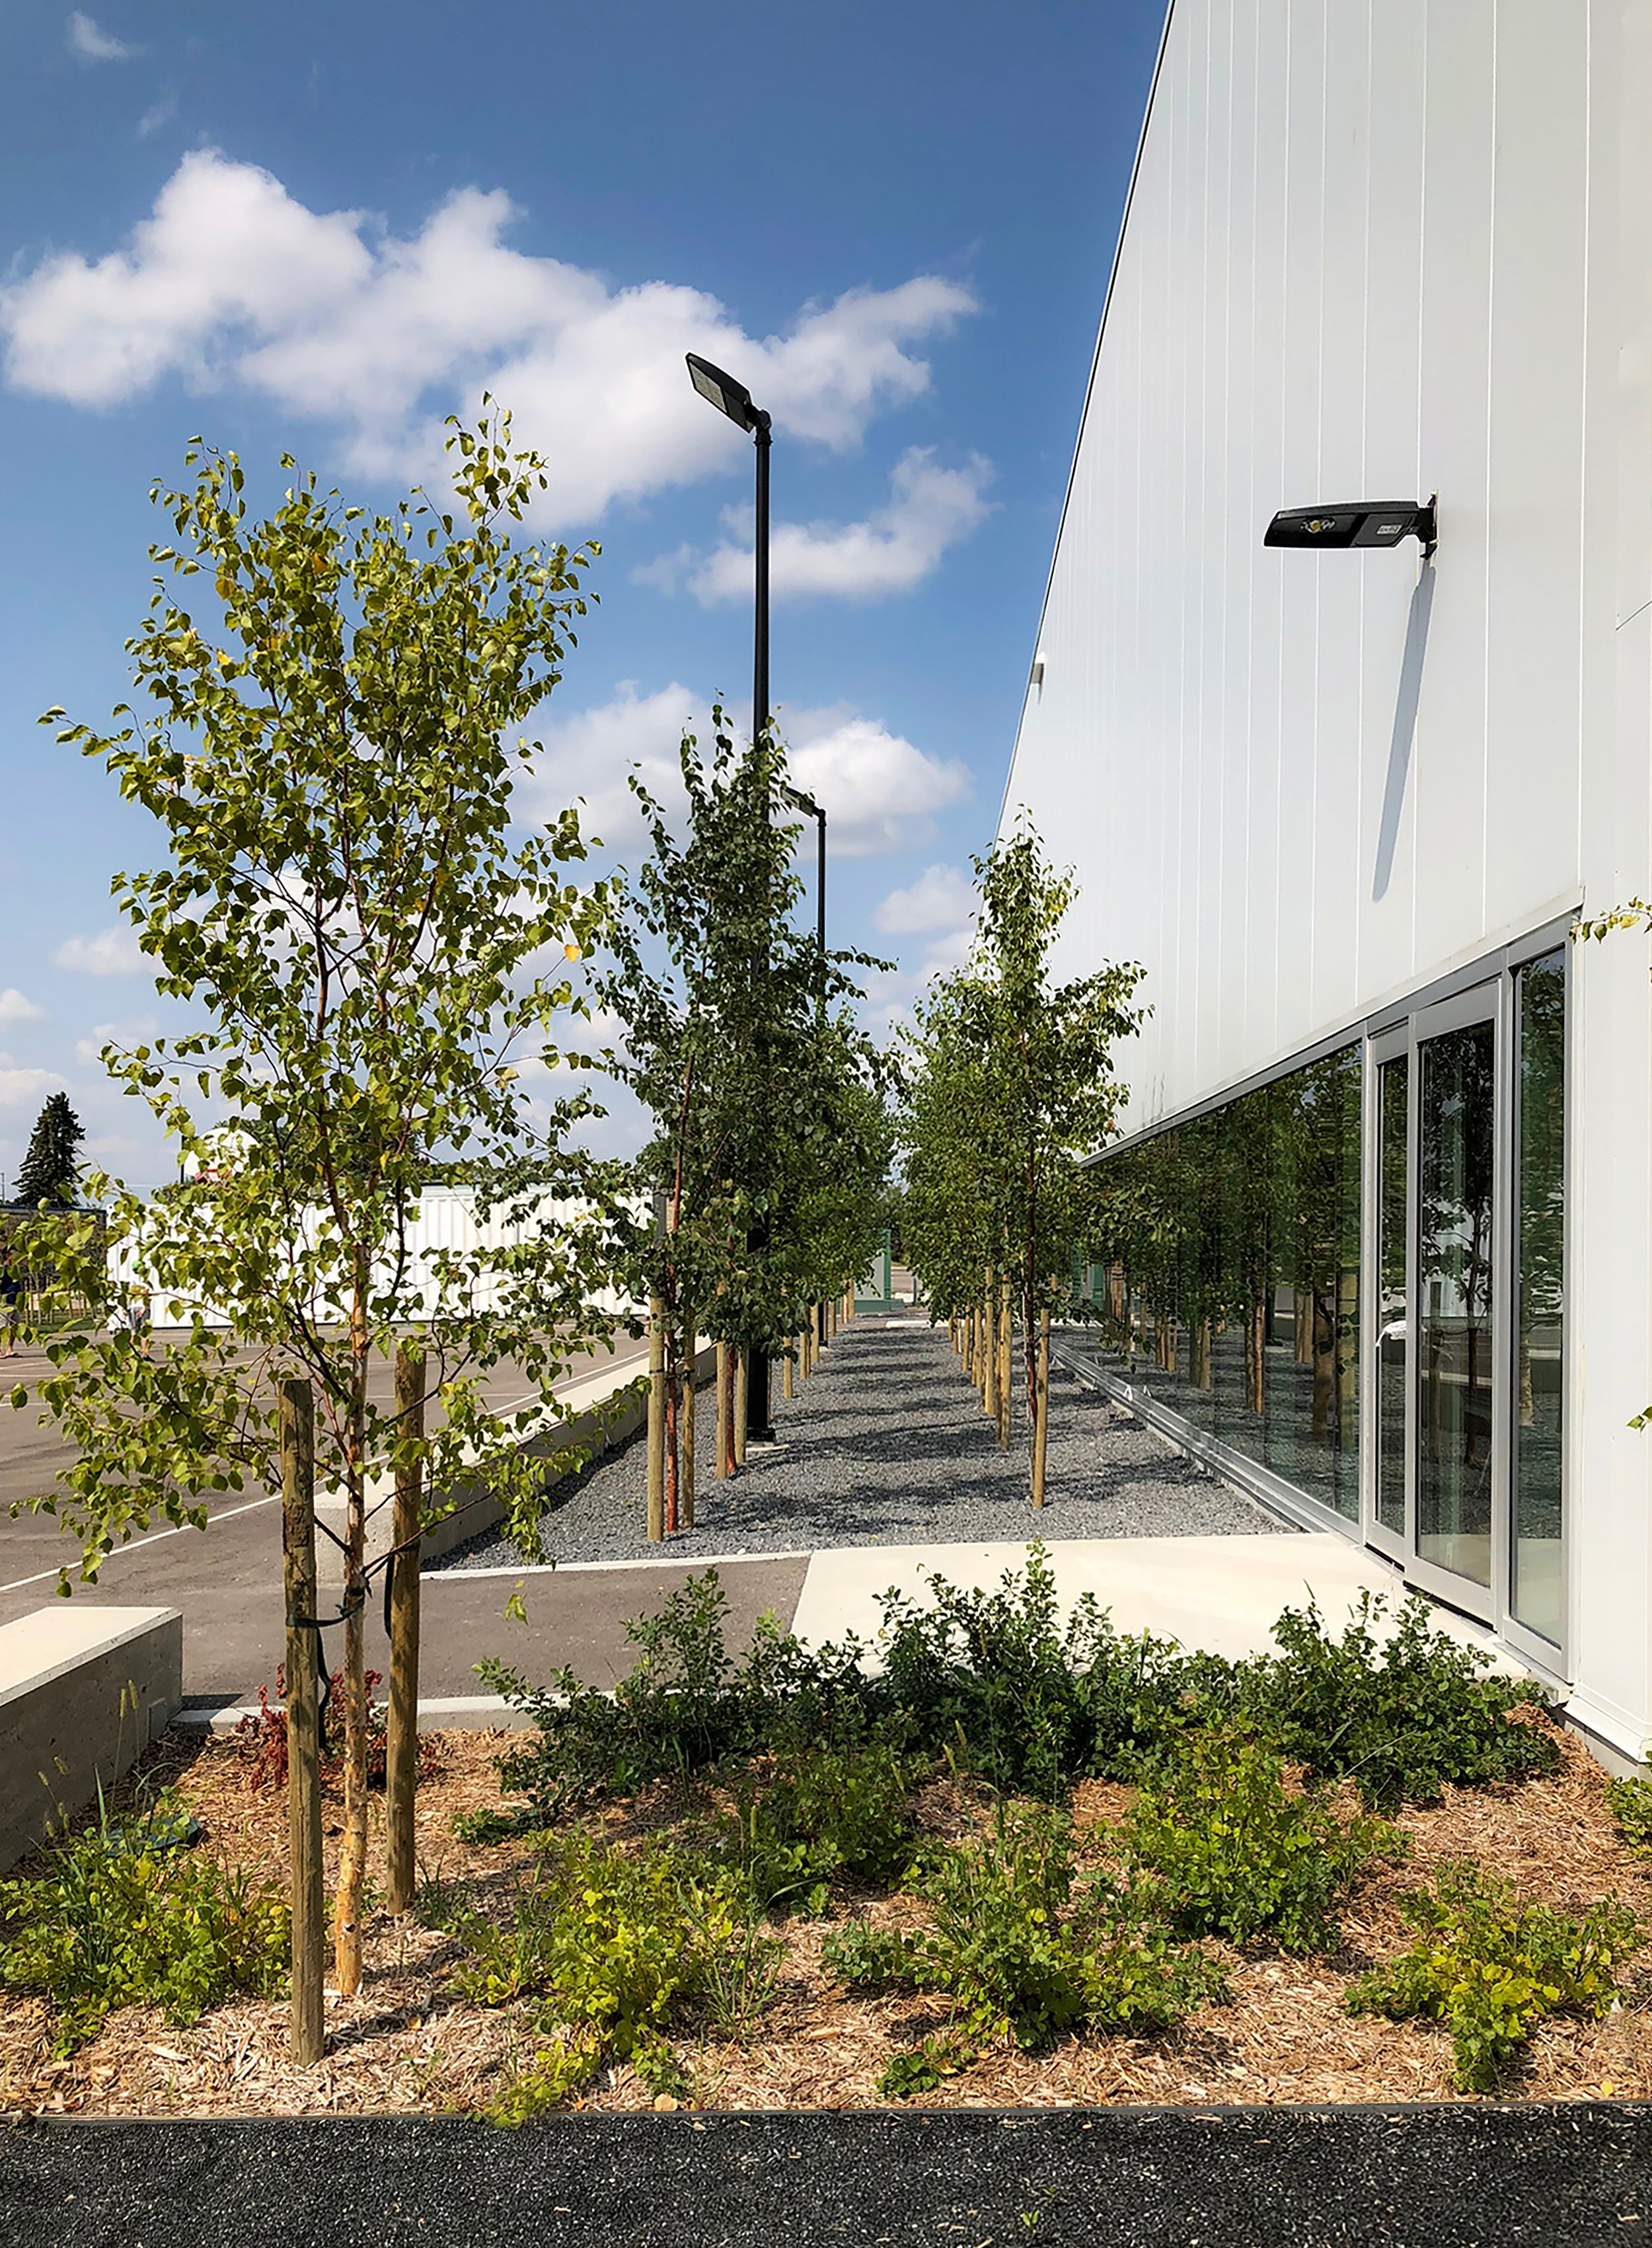 Southeast Collegiate _ Landscape Architecture _ Winnipeg _ Courtyard Design.jpg